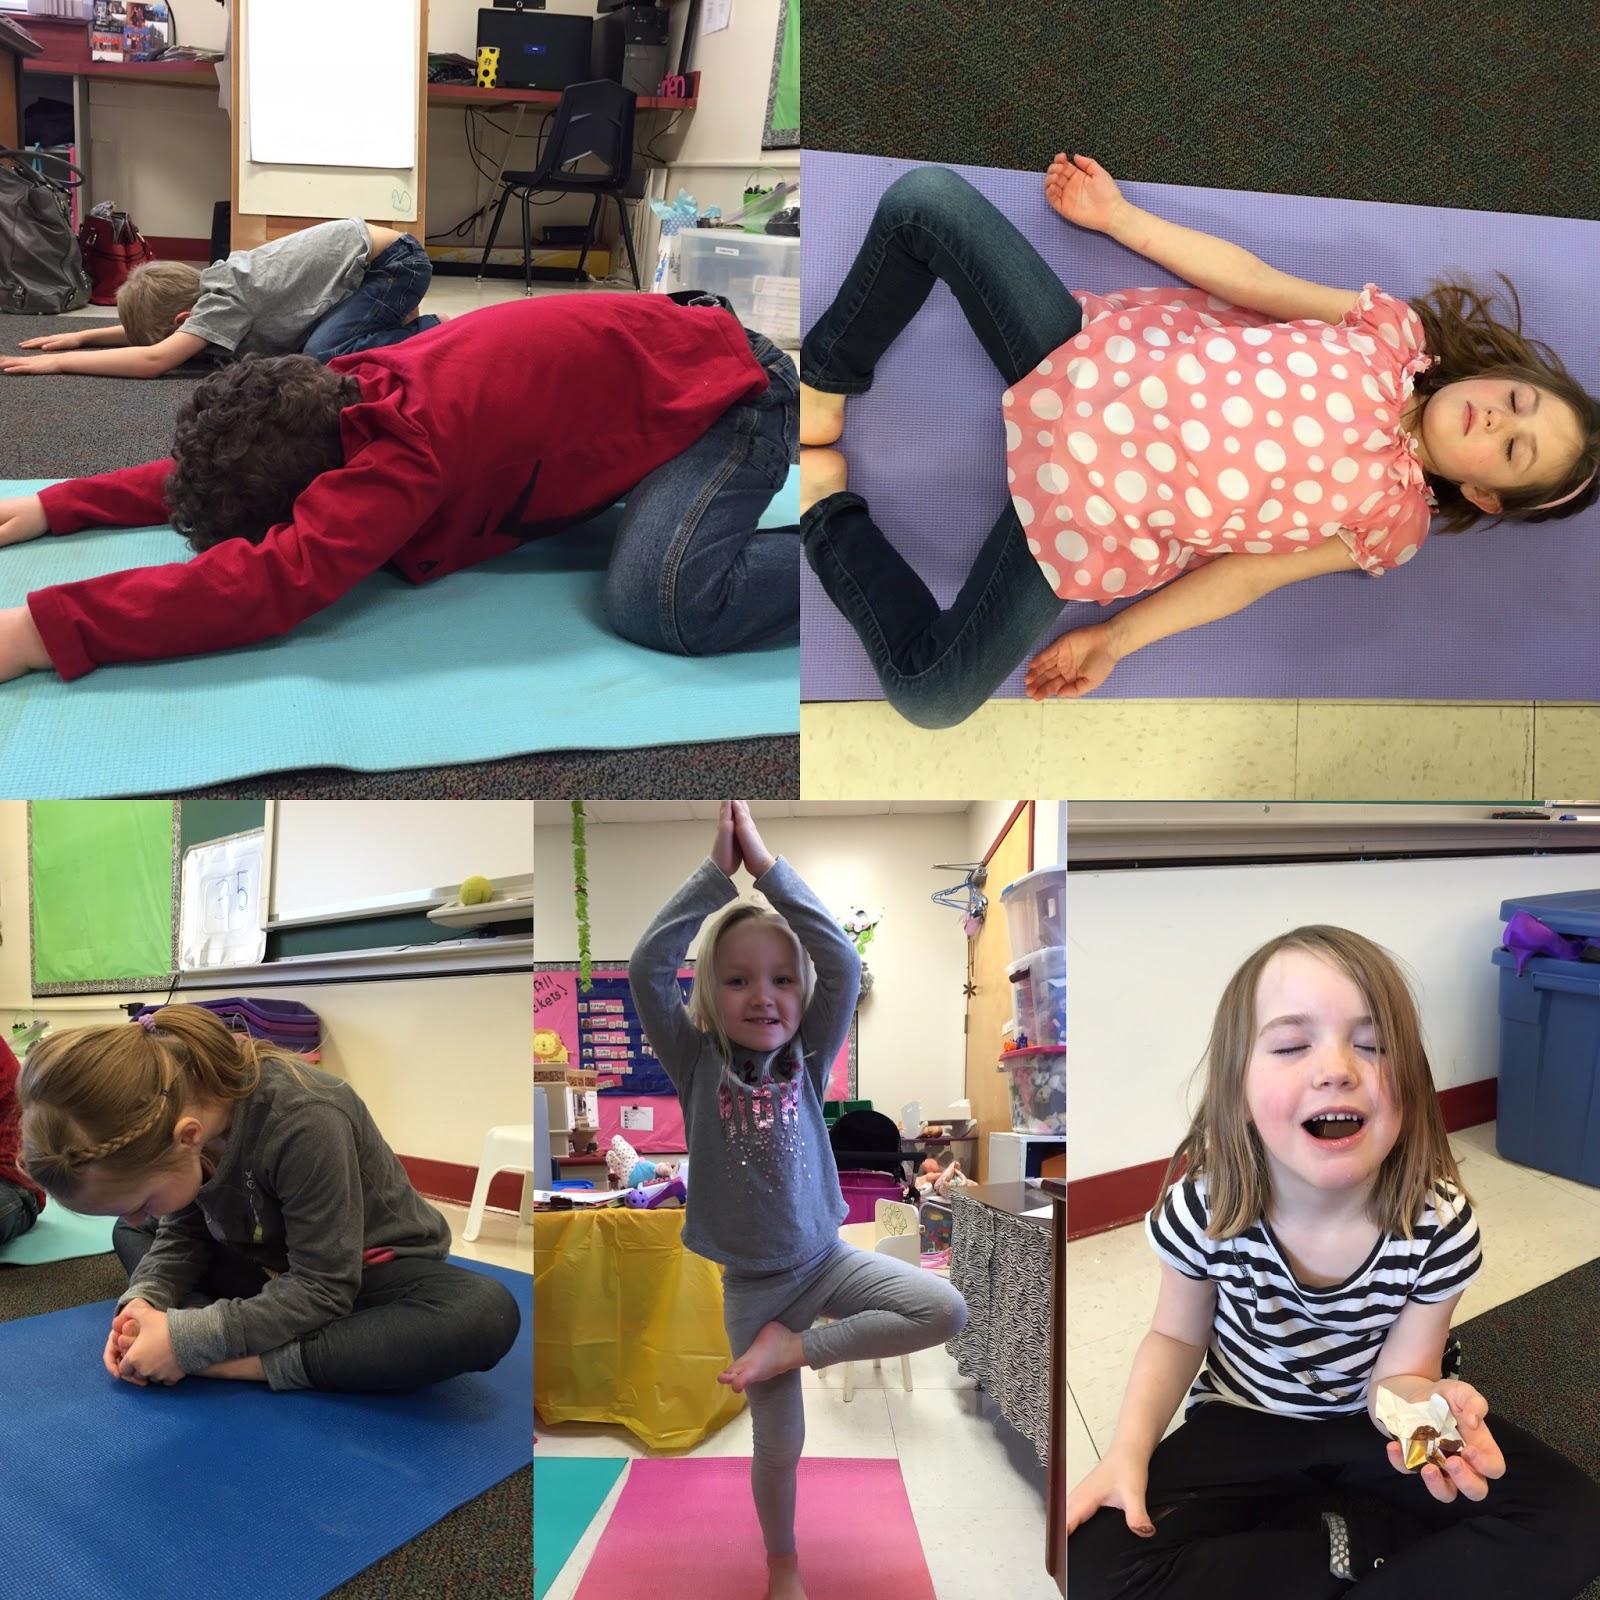 Kindergarten Diva: You Asked, Kindergarten Diva Answers